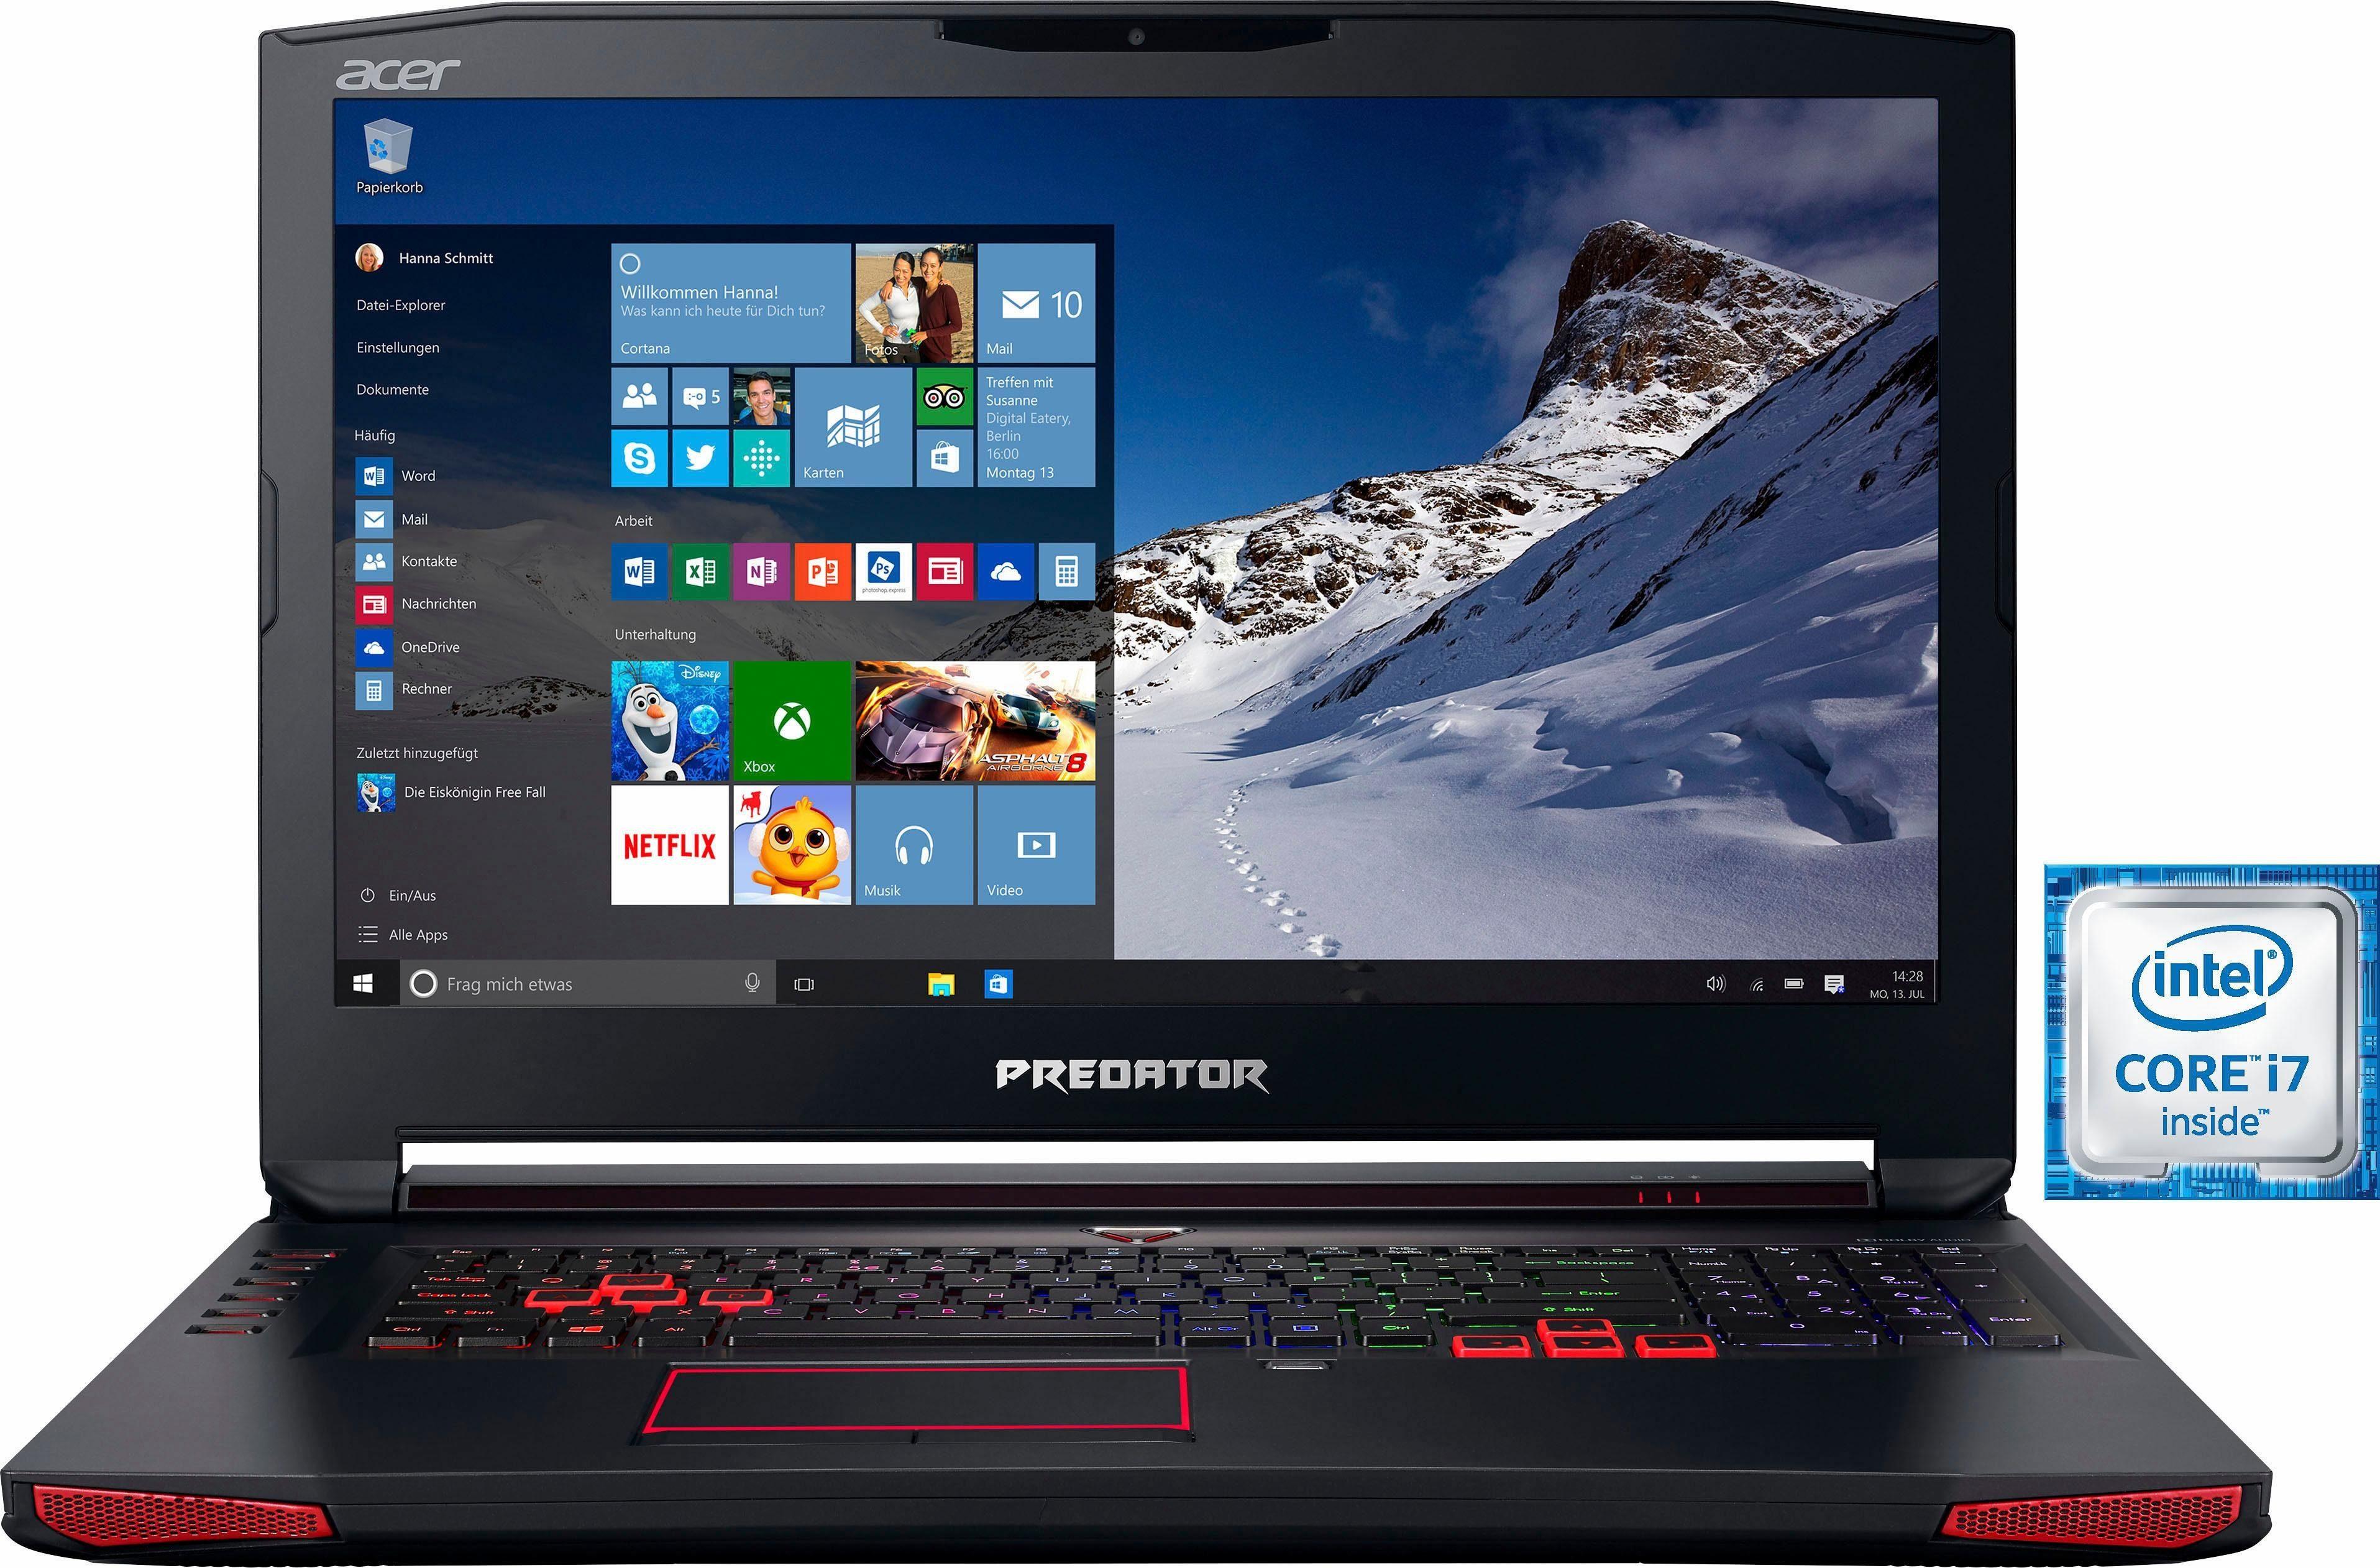 Acer Predator 17 (G9-793-79NC) Notebook, Intel® Core™ i7, 43,9 cm (17,3 Zoll), 1256 GB Speicher